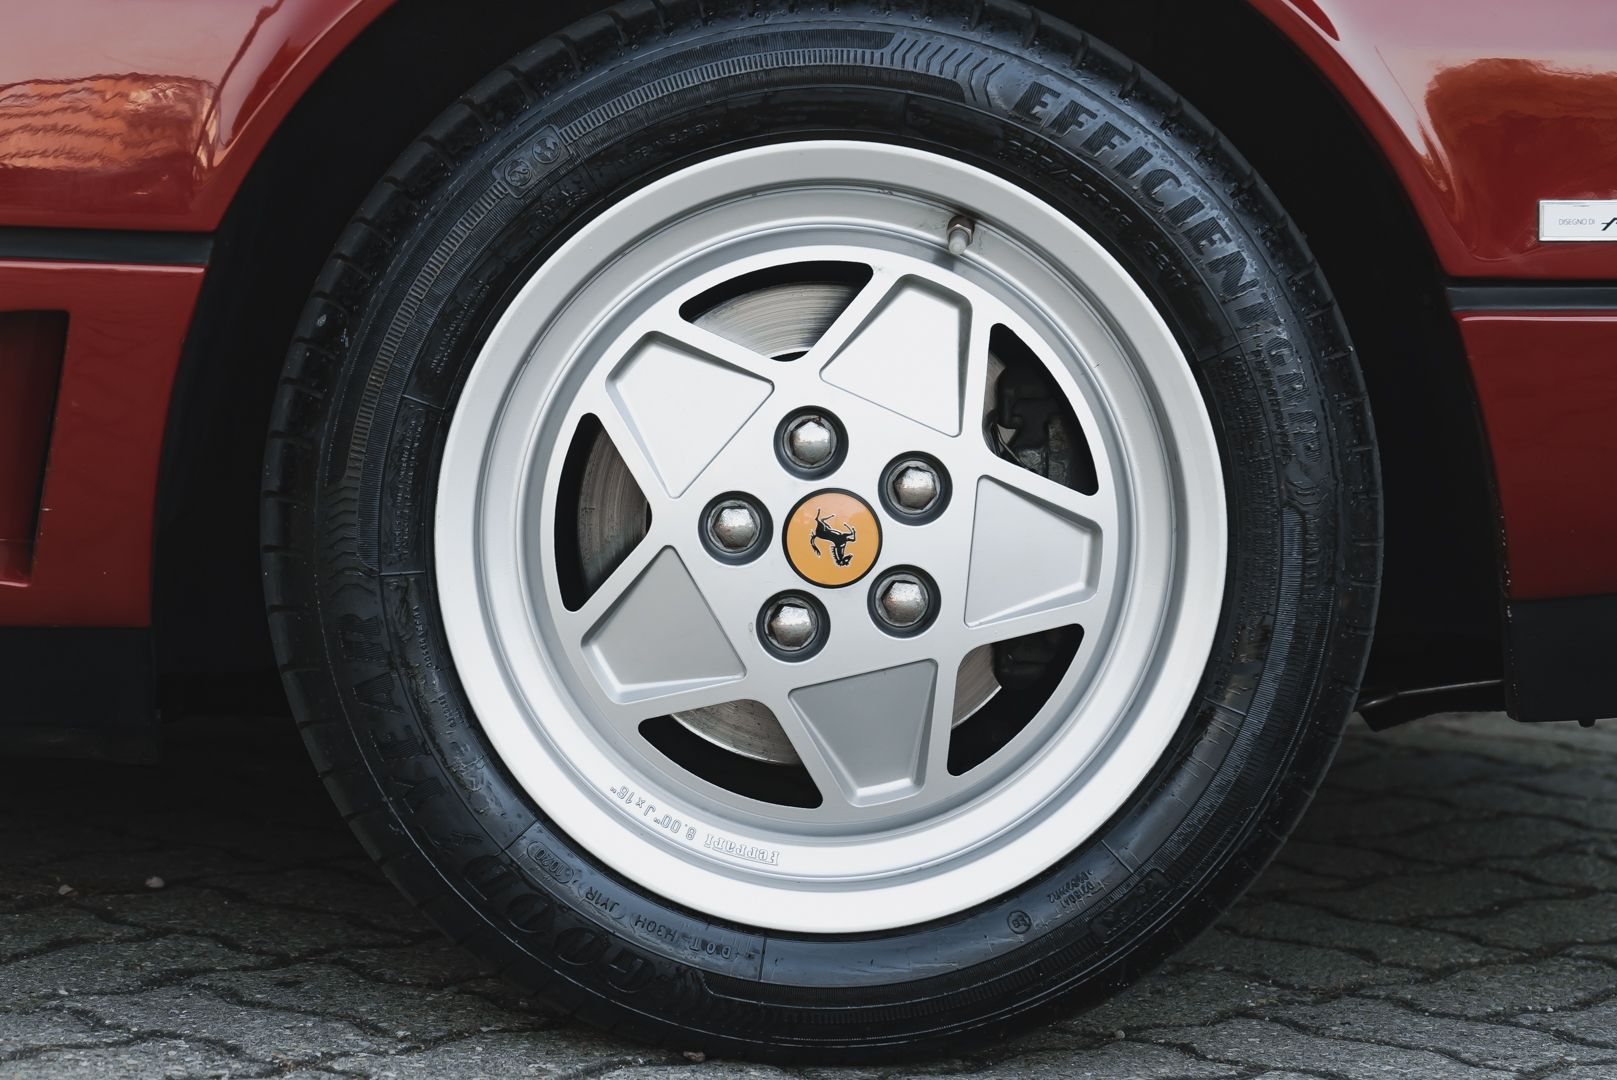 1988 FERRARI 208 GTS TURBO INTERCOOLER 75420